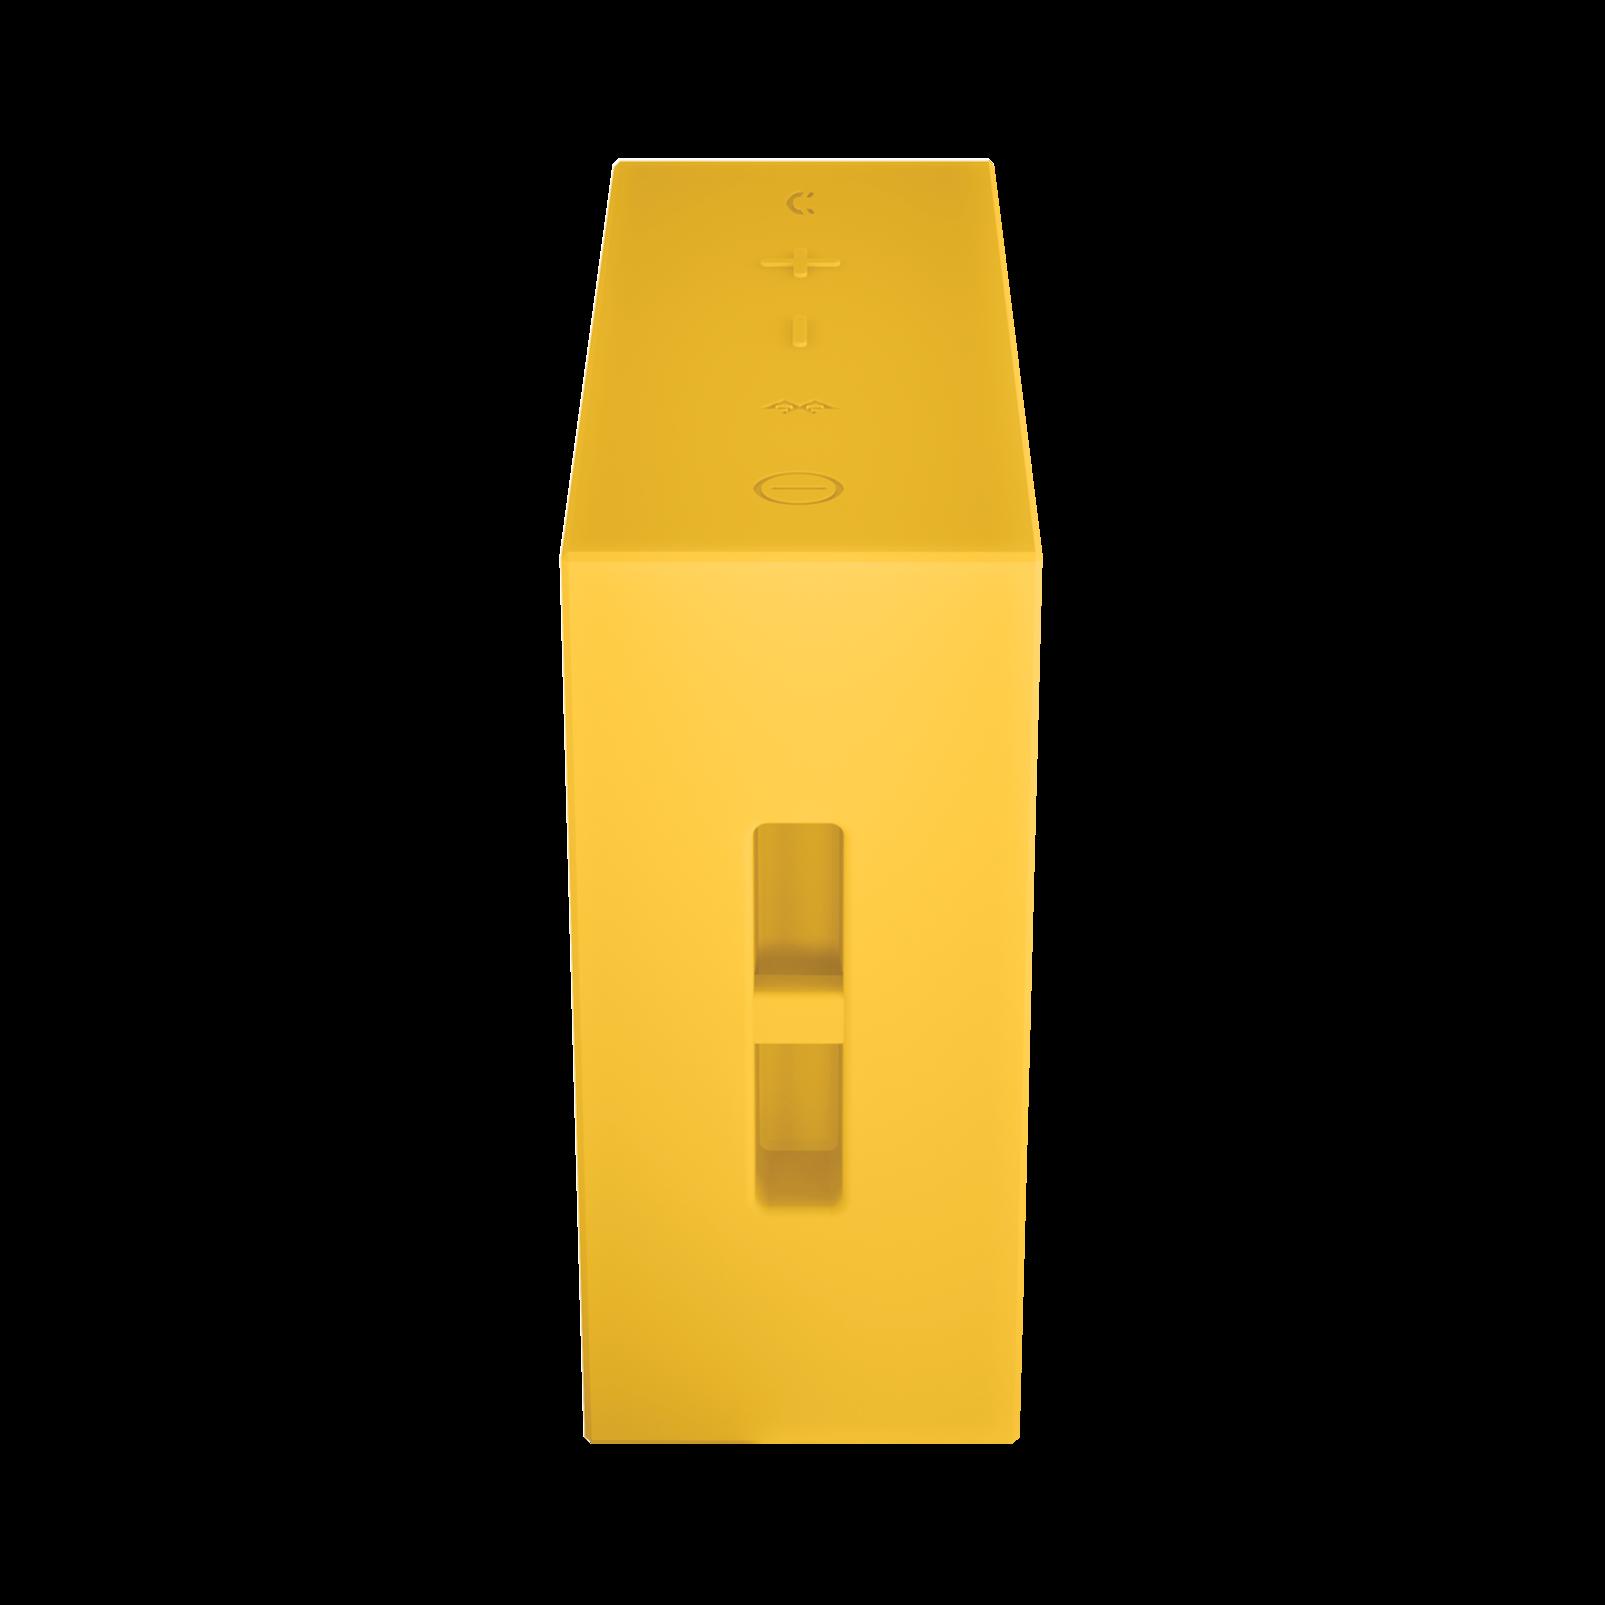 JBL GO - Yellow - Full-featured, great-sounding, great-value portable speaker - Detailshot 2